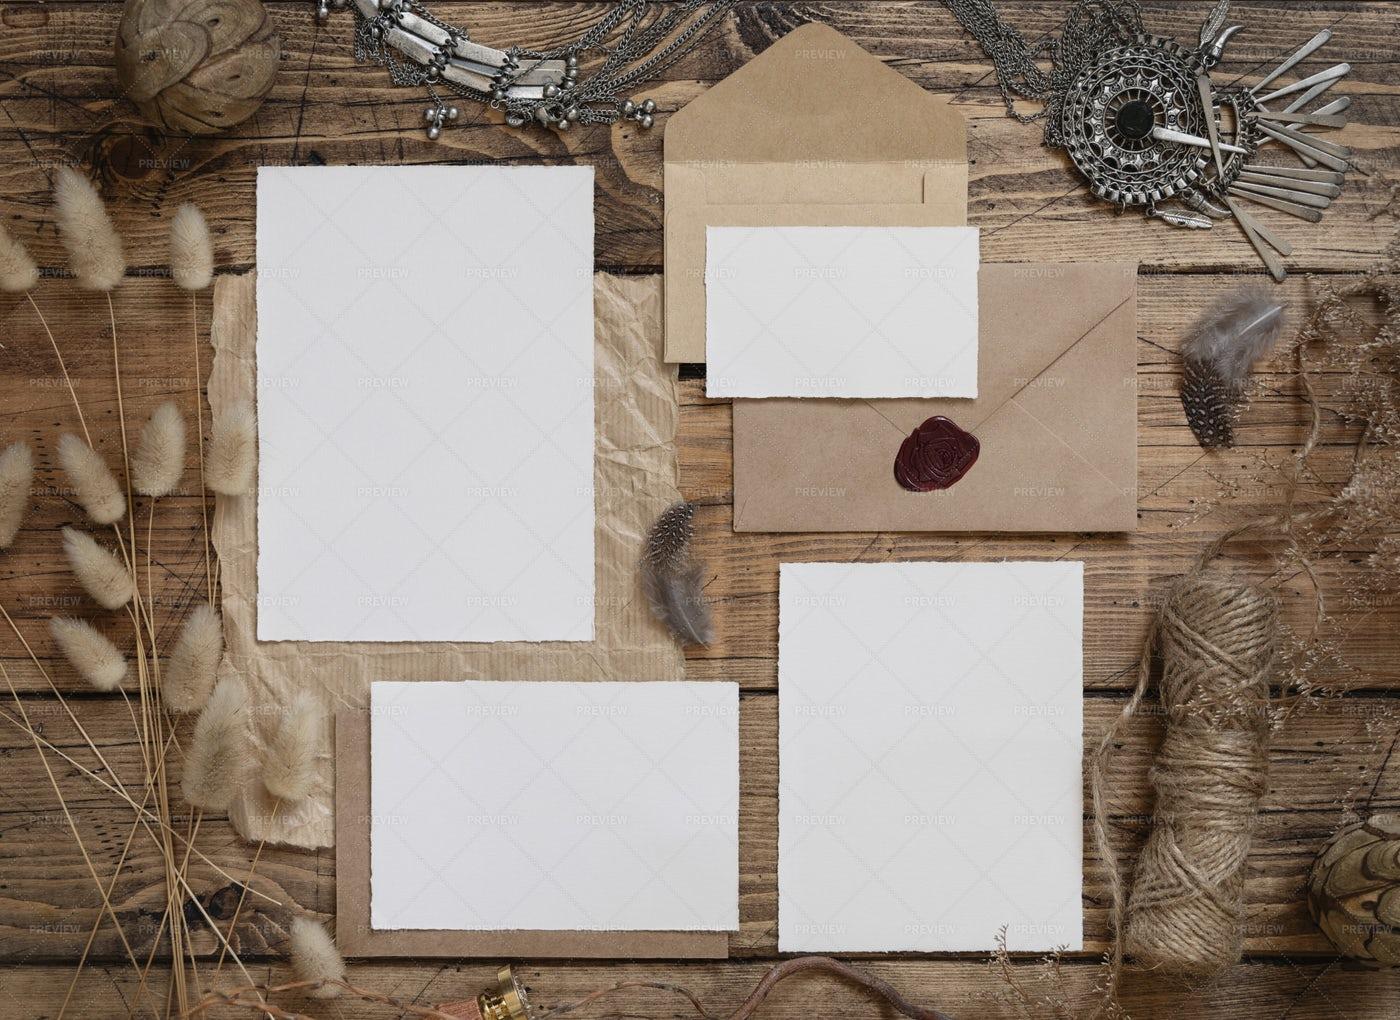 Wedding Boho Blank Cards: Stock Photos